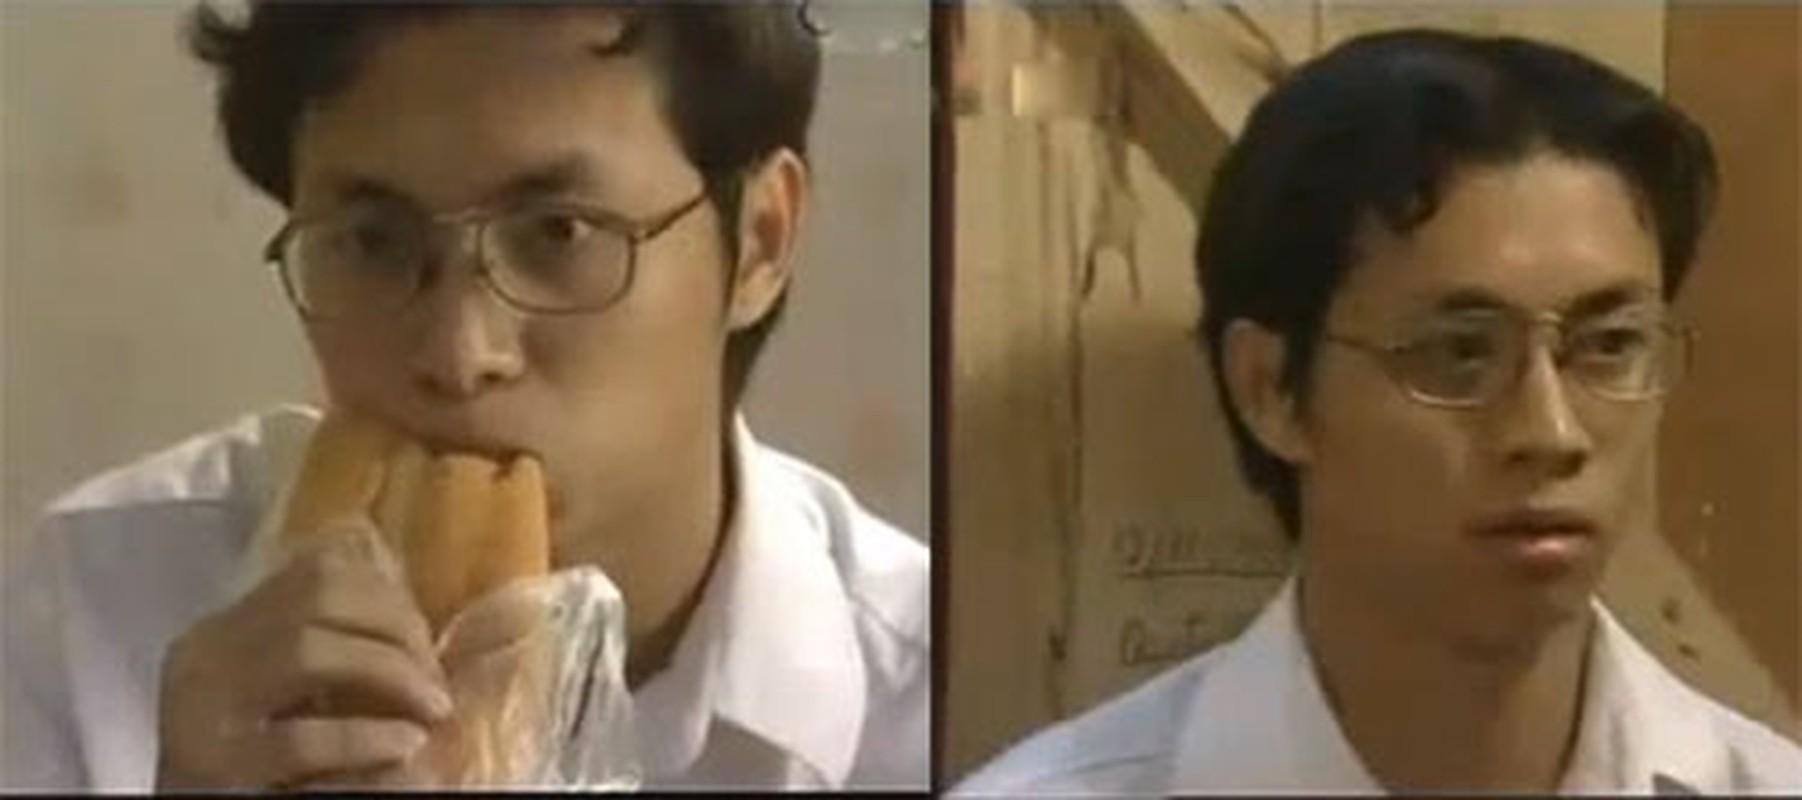 Loat bat ngo ve A quan Duong len dinh Olympia Nguyen Thanh Vinh-Hinh-2